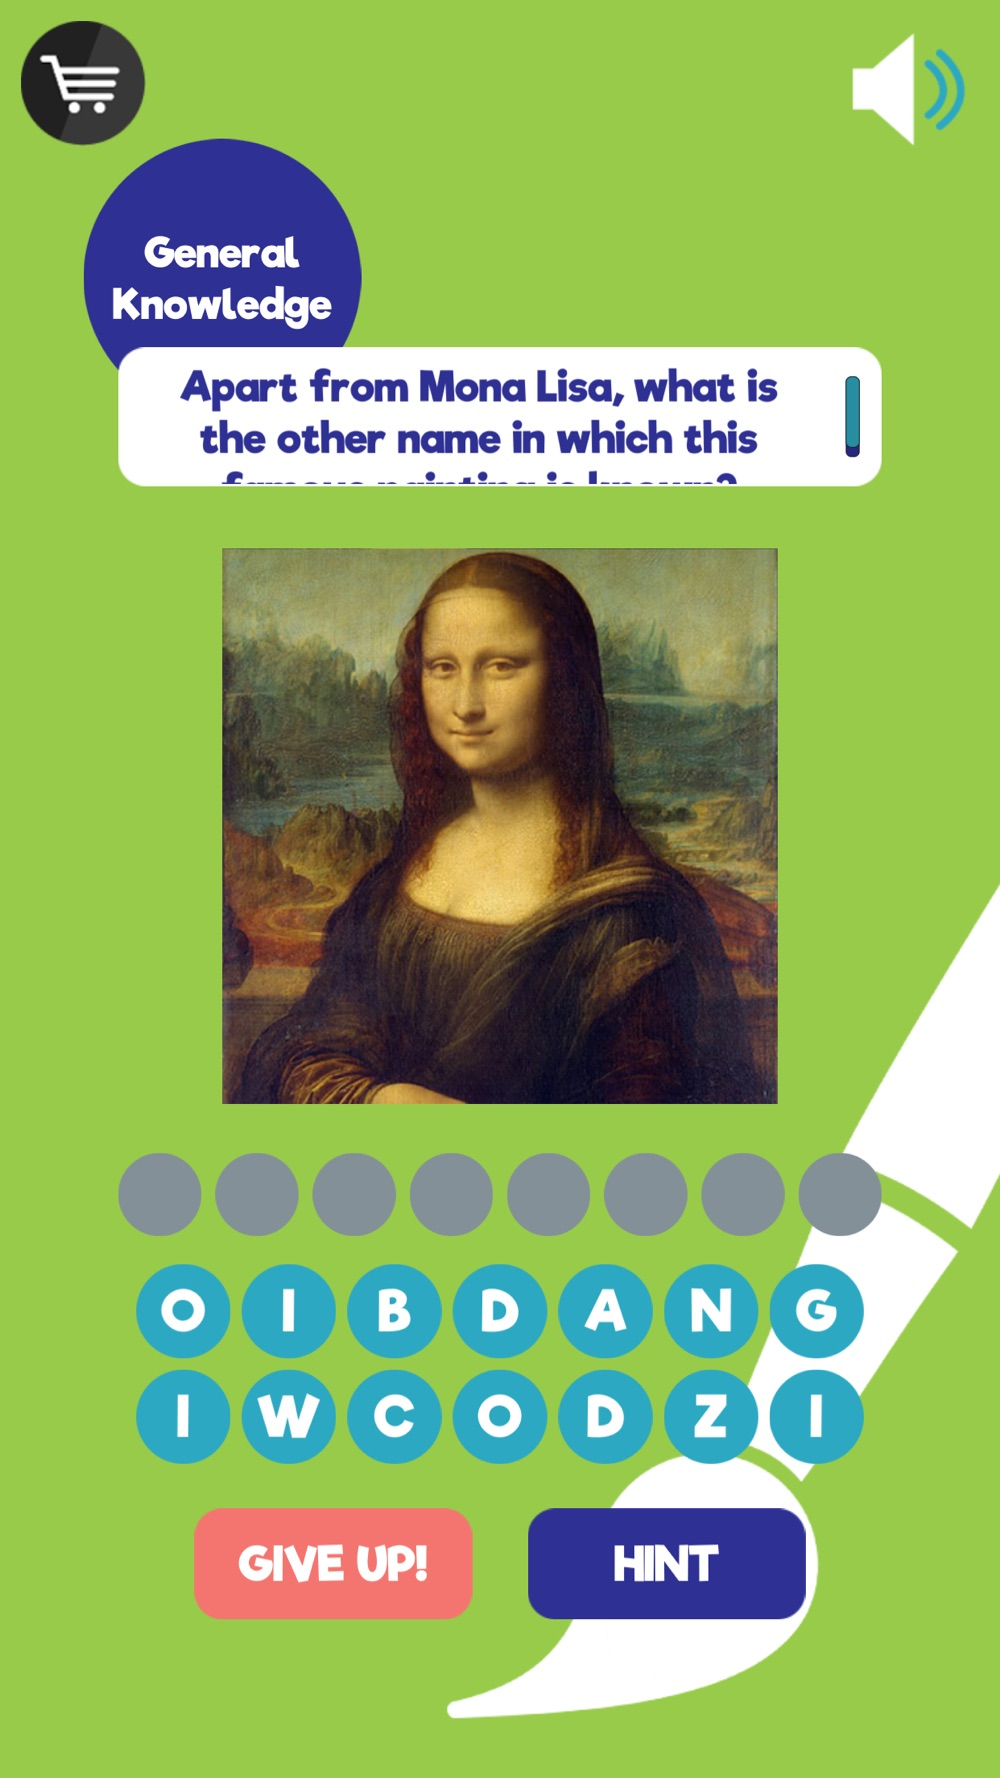 Art: Quiz Game hack tool